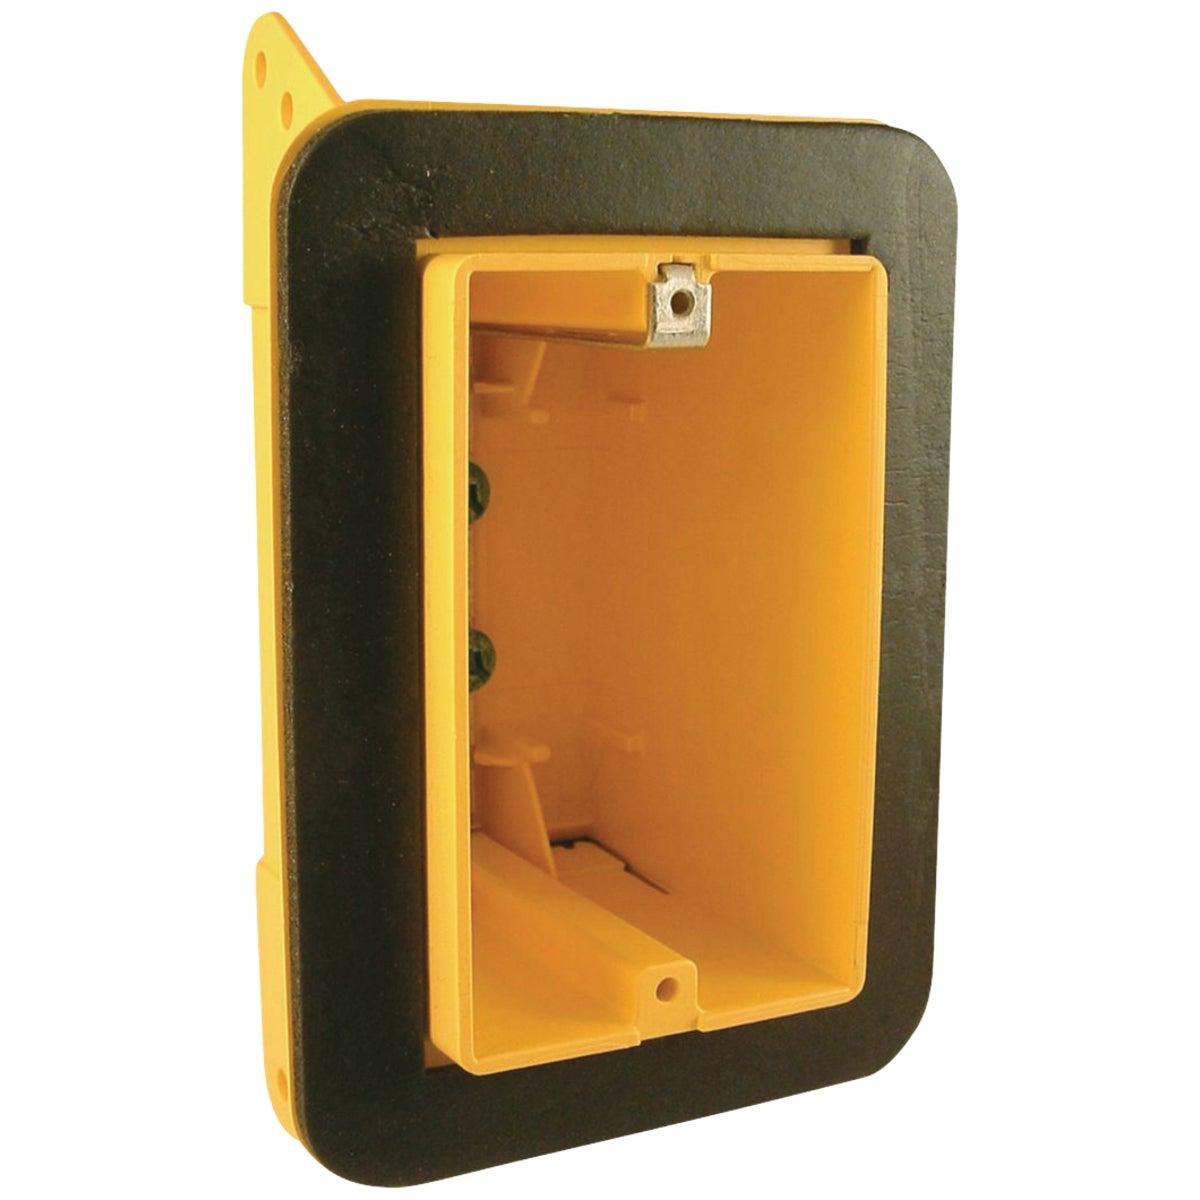 1 GANG VAPOR BARRIER BOX - FN23 by Thomas & Betts